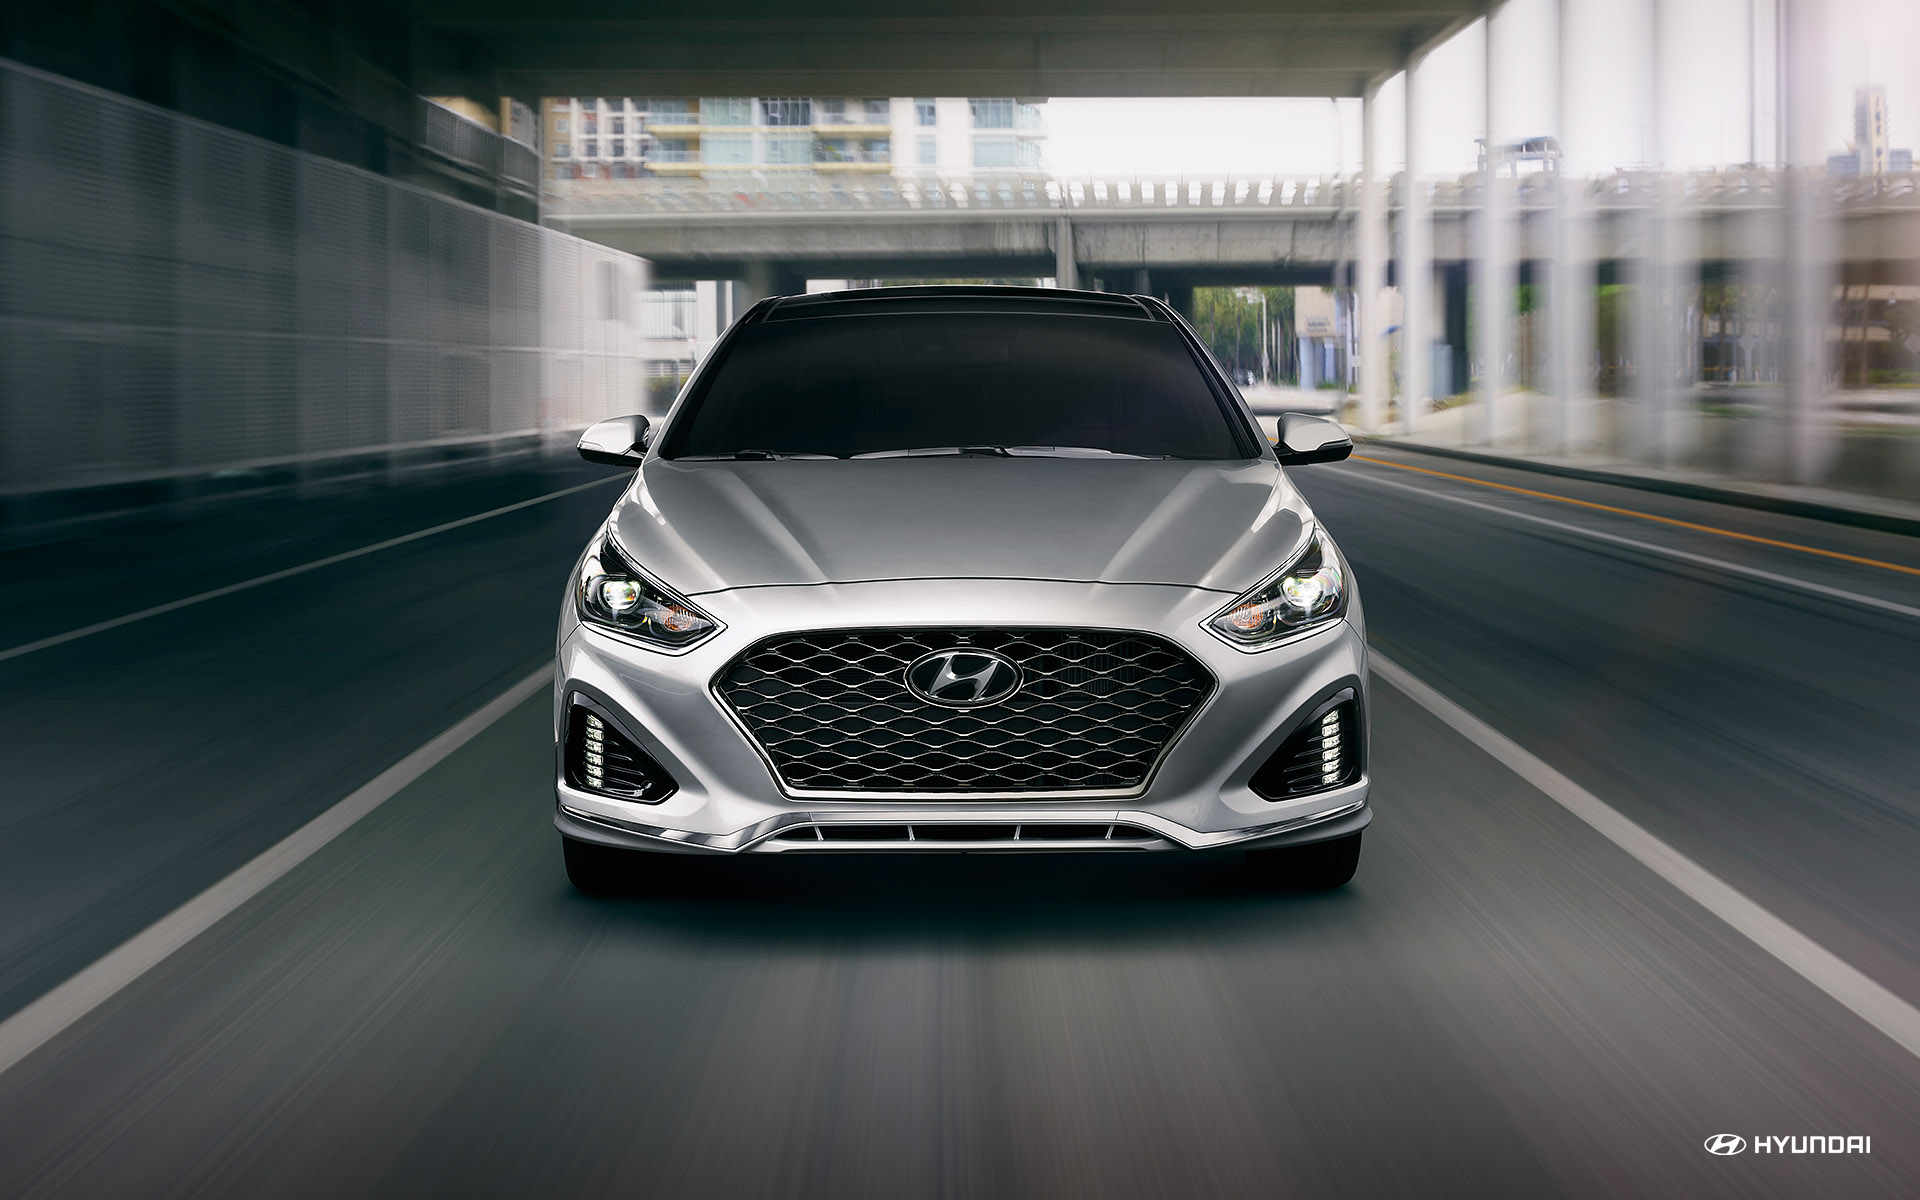 Buy, Lease, or Finance the 2019 Hyundai Sonata in Southfield MI